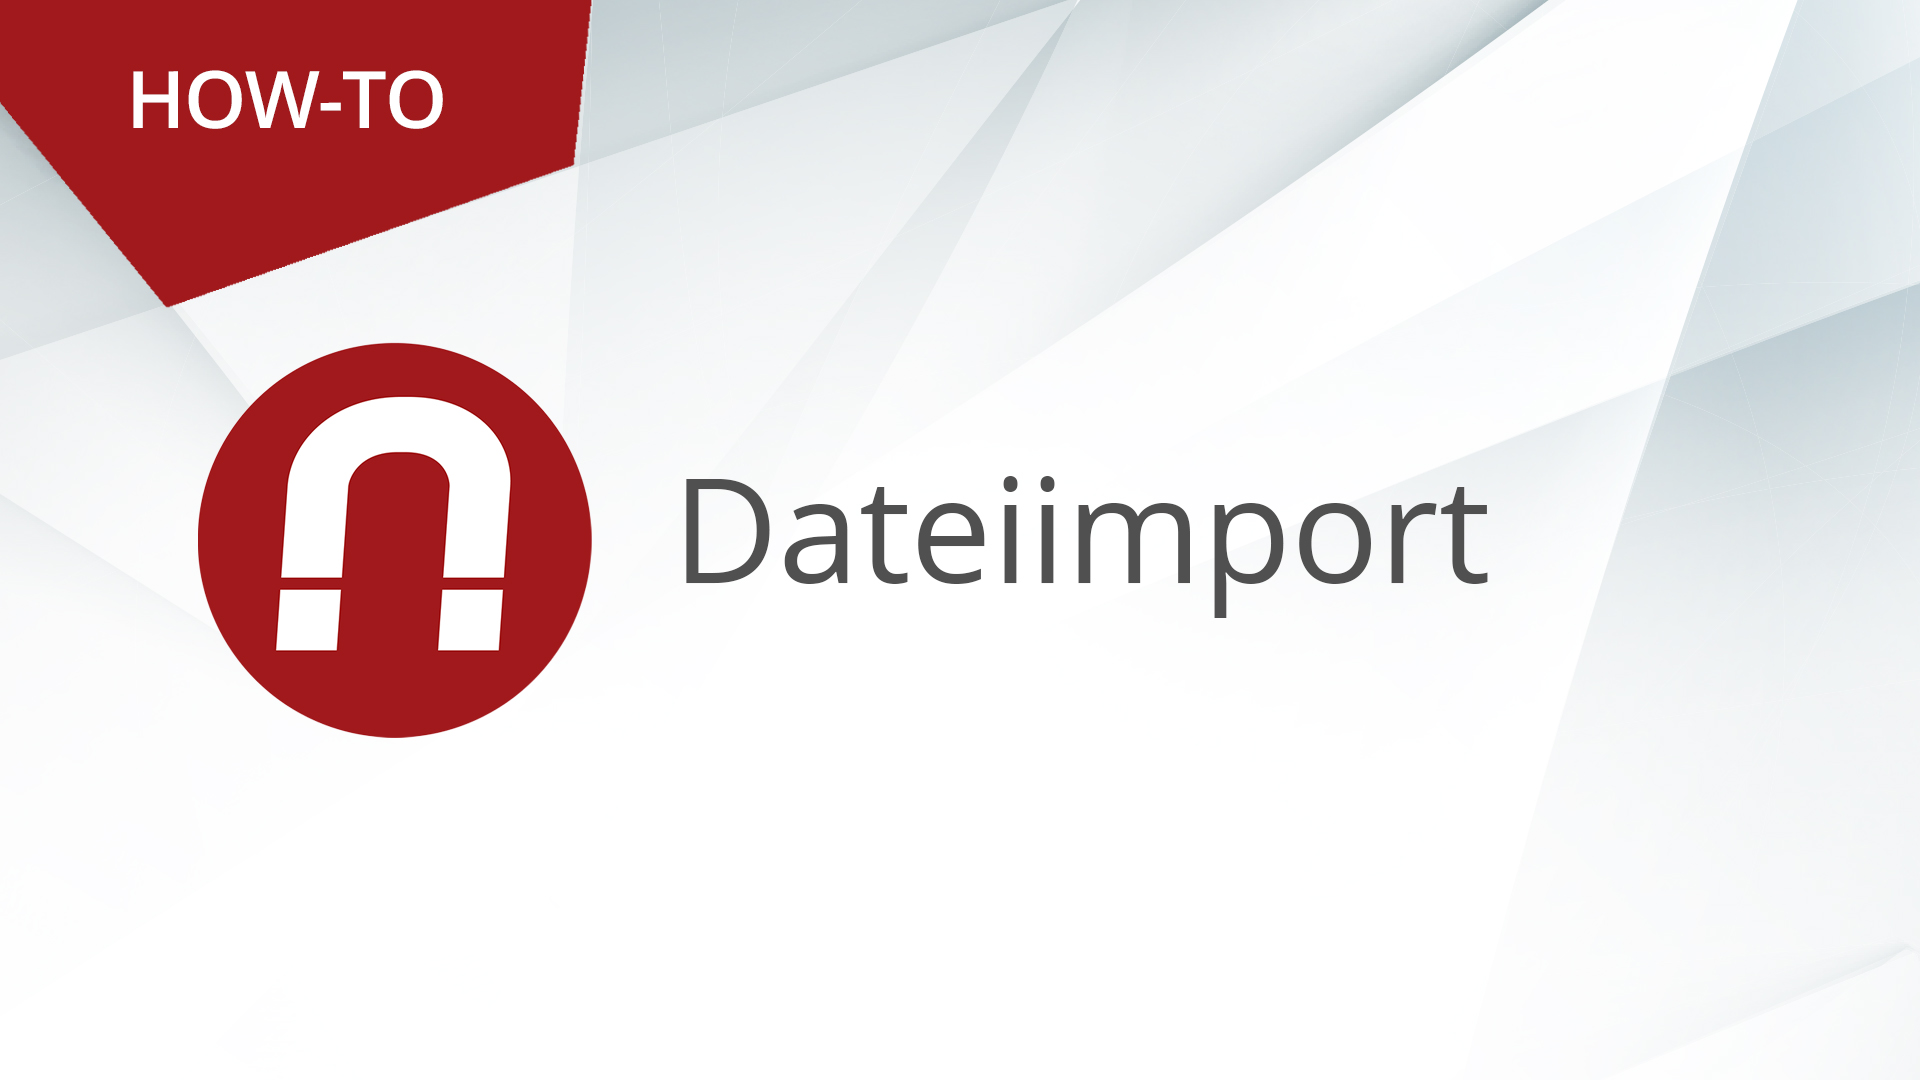 How-To: AMAGNO Basics – Dateiimport